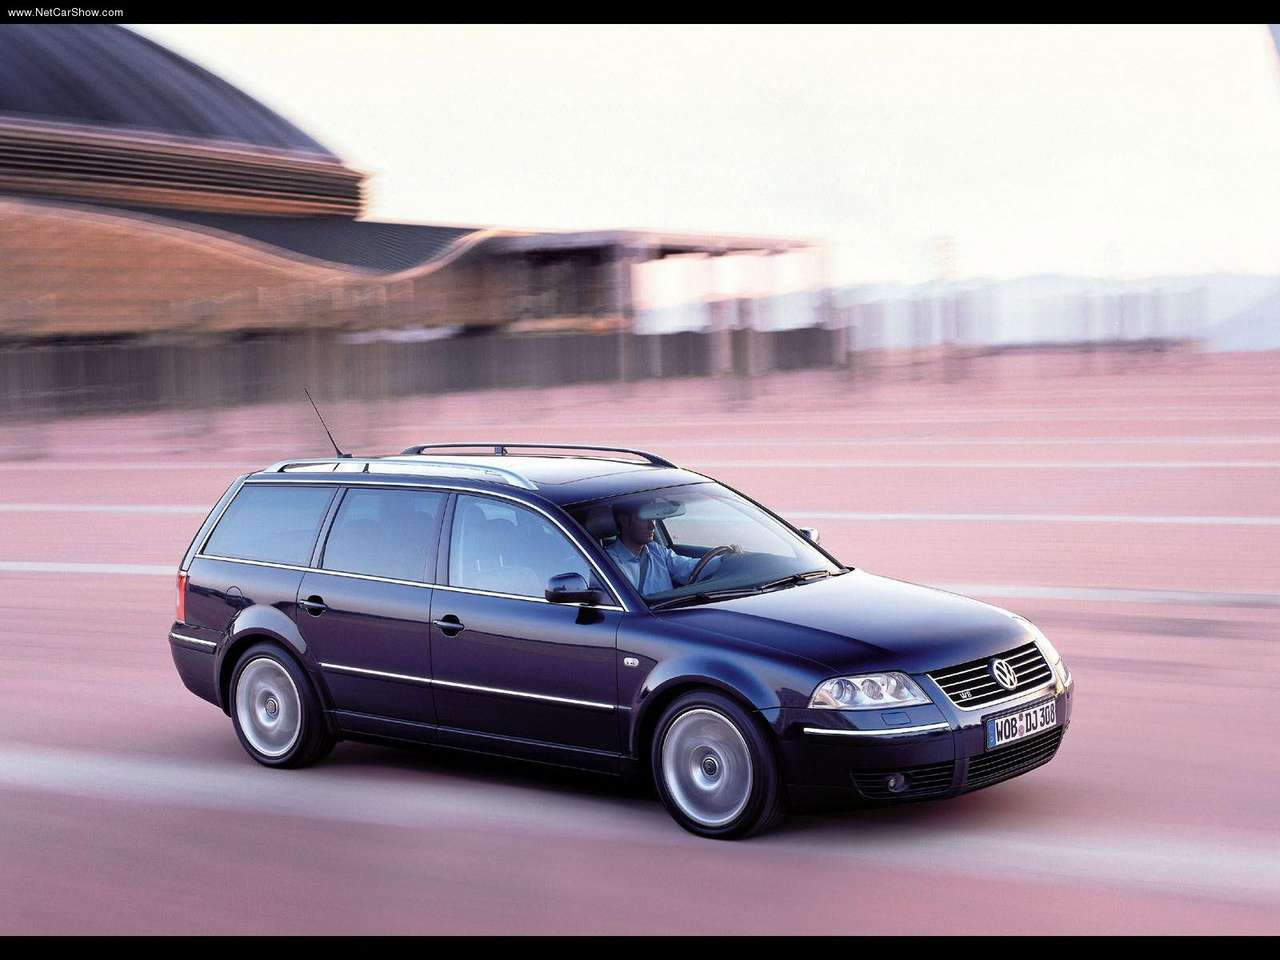 http://1.bp.blogspot.com/-JLjh4o7BjyQ/TXs37KDfwHI/AAAAAAAANNA/MvYJ_2da0OQ/s1600/Volkswagen-Passat_W8_Variant_2001_1280x960_wallpaper_02.jpg